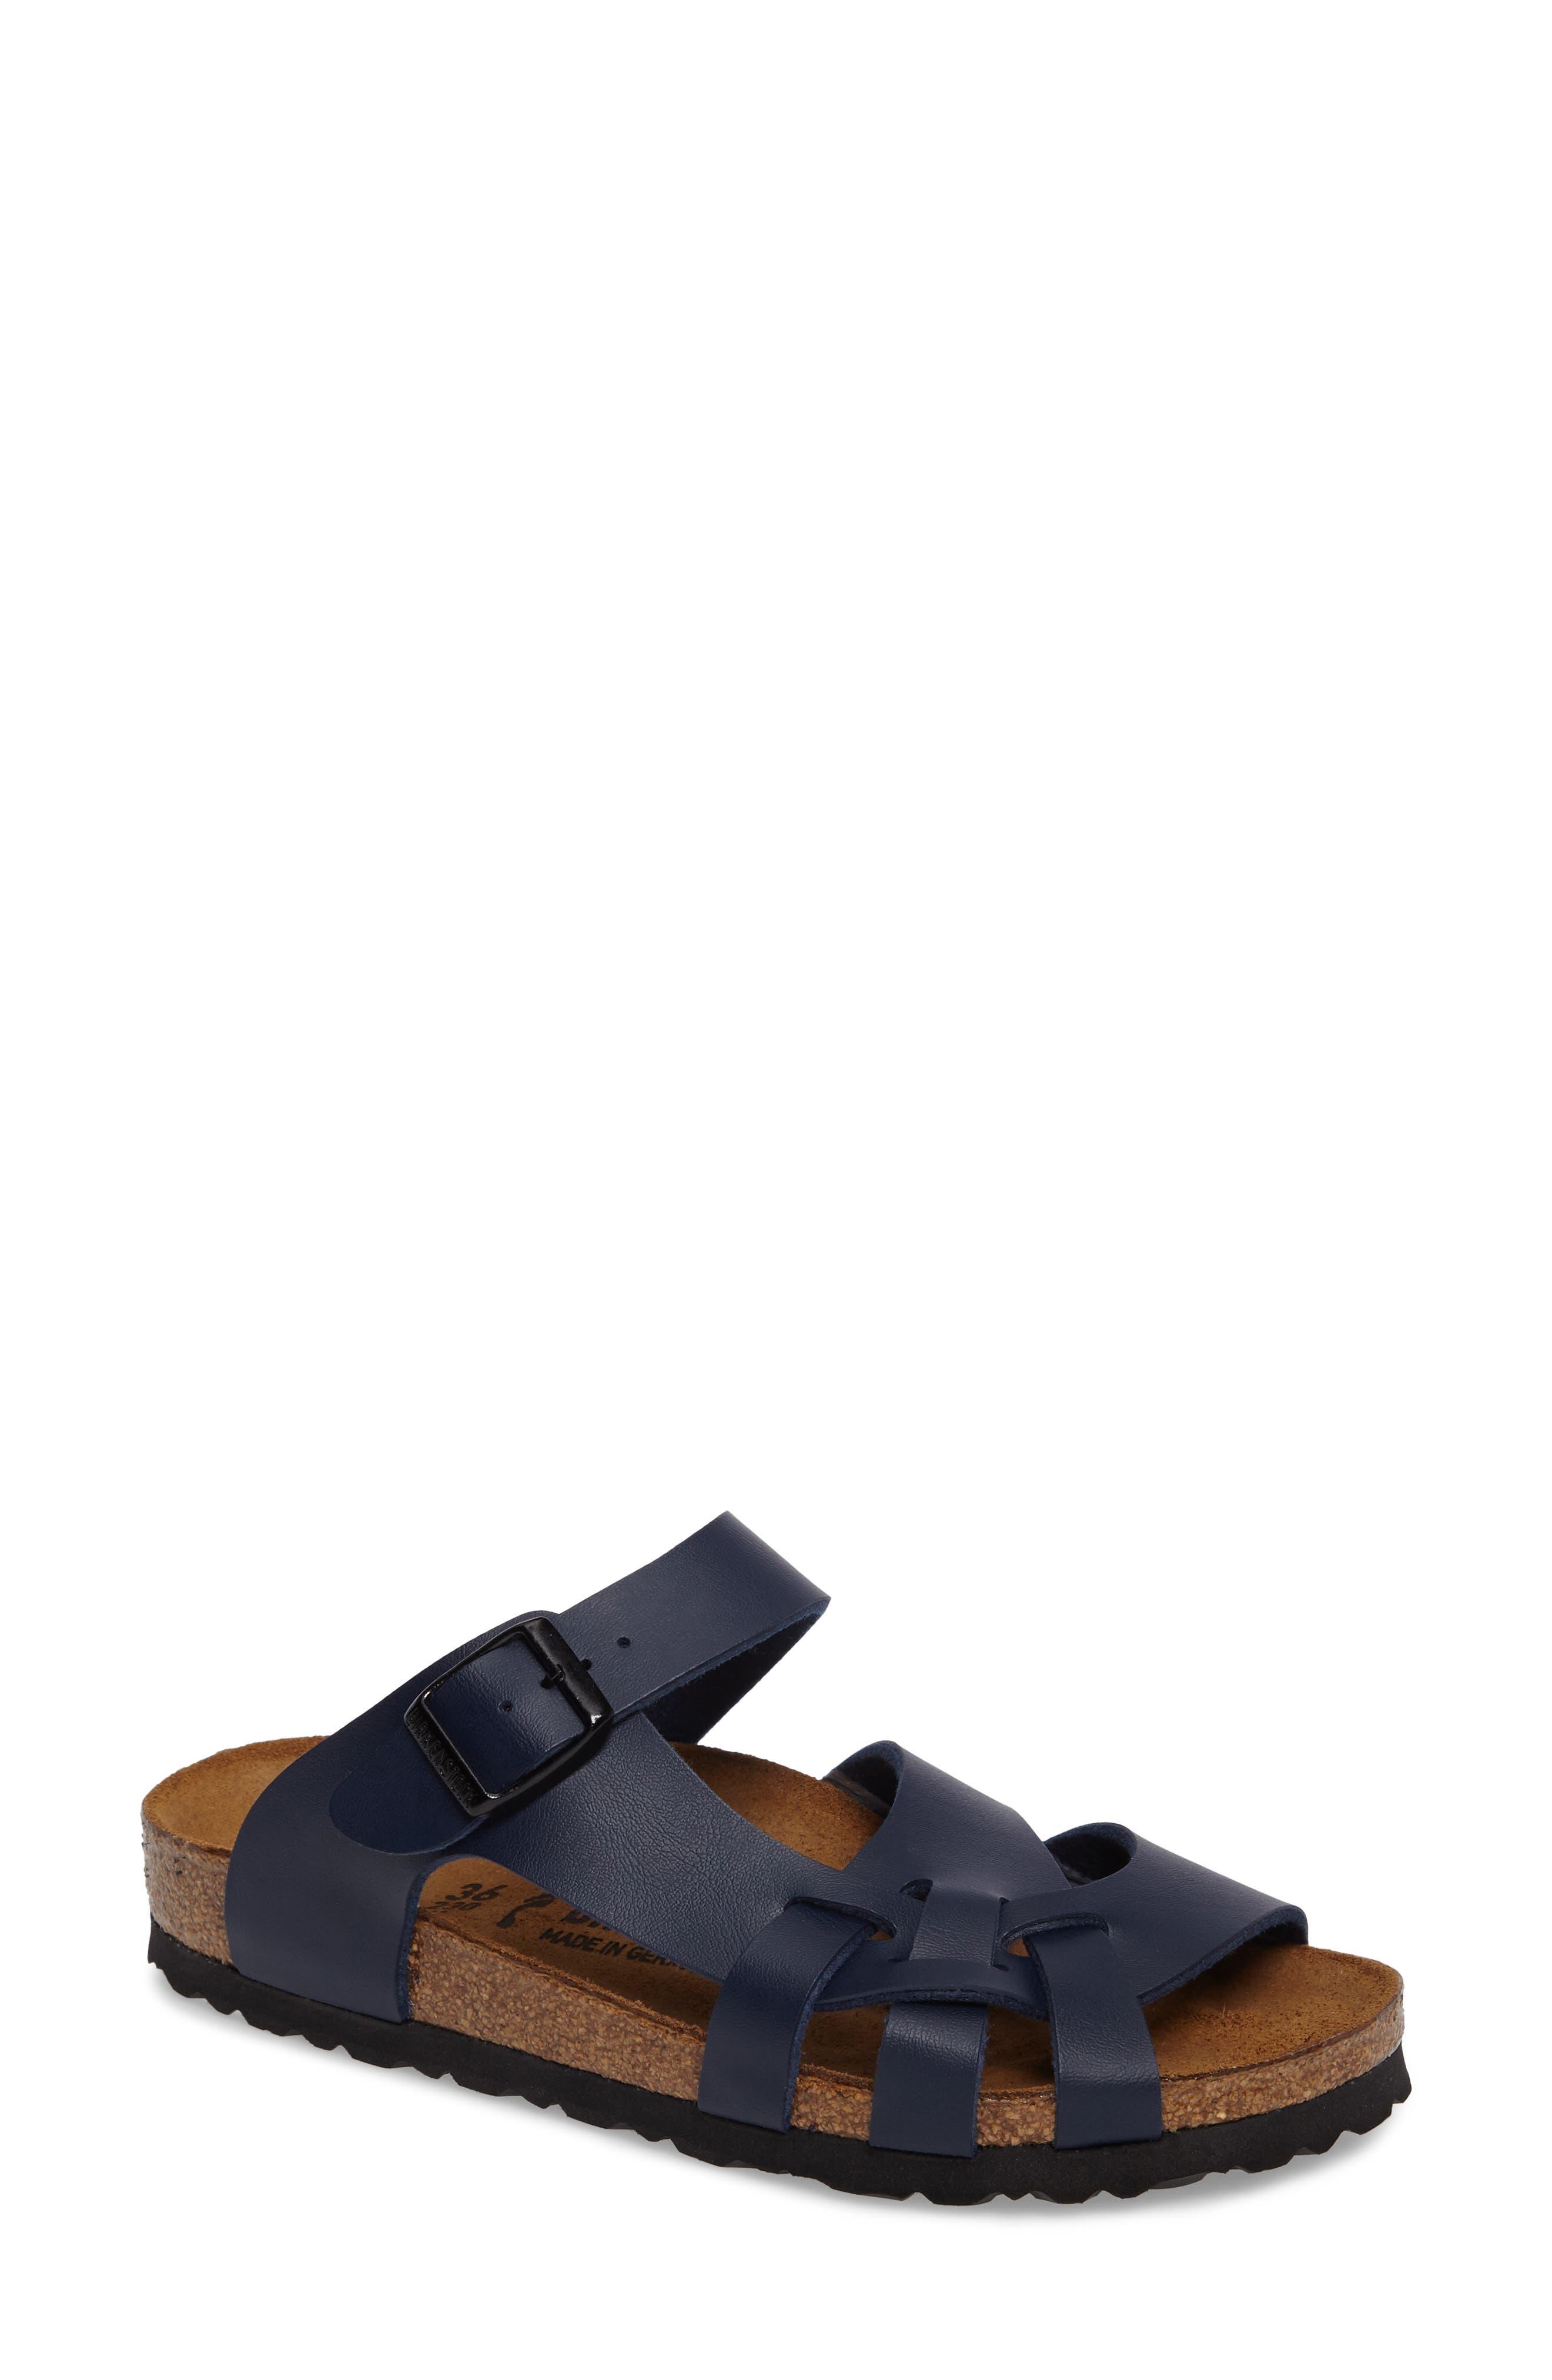 Birkenstock 'Pisa' Sandal